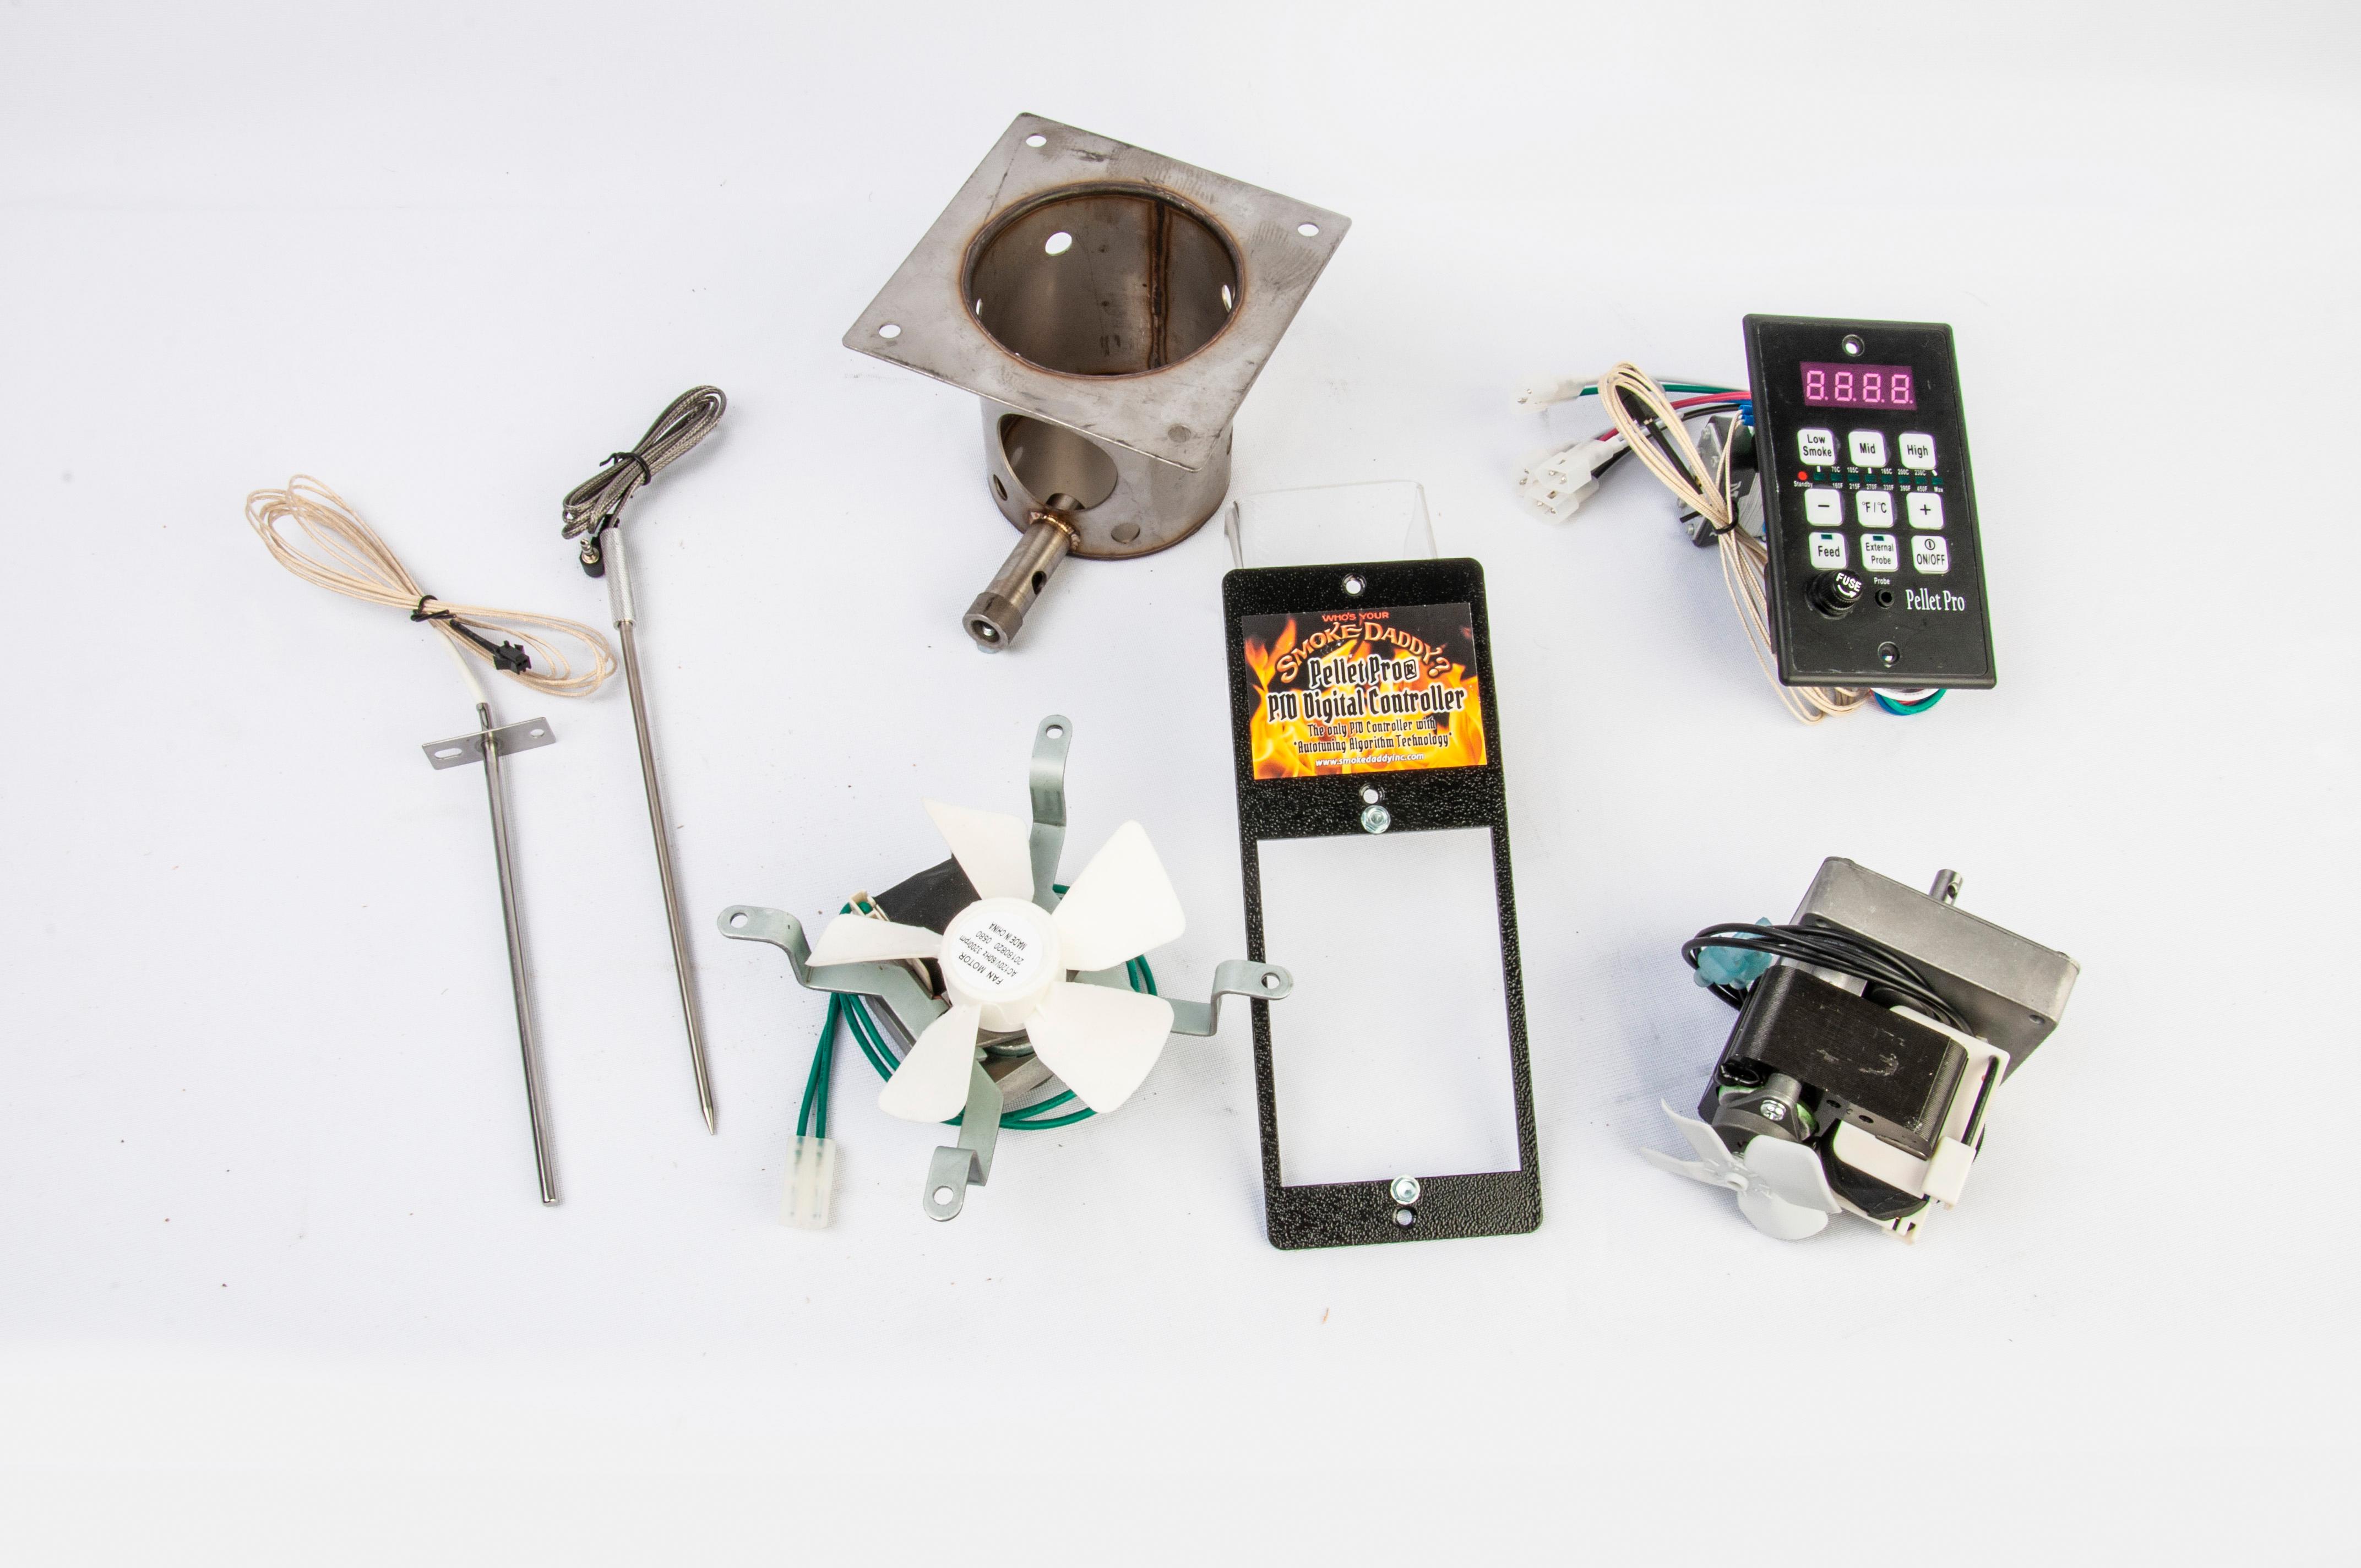 Pellet Pro PID Controller *Complete* Pellet Grill Upgrade Kit